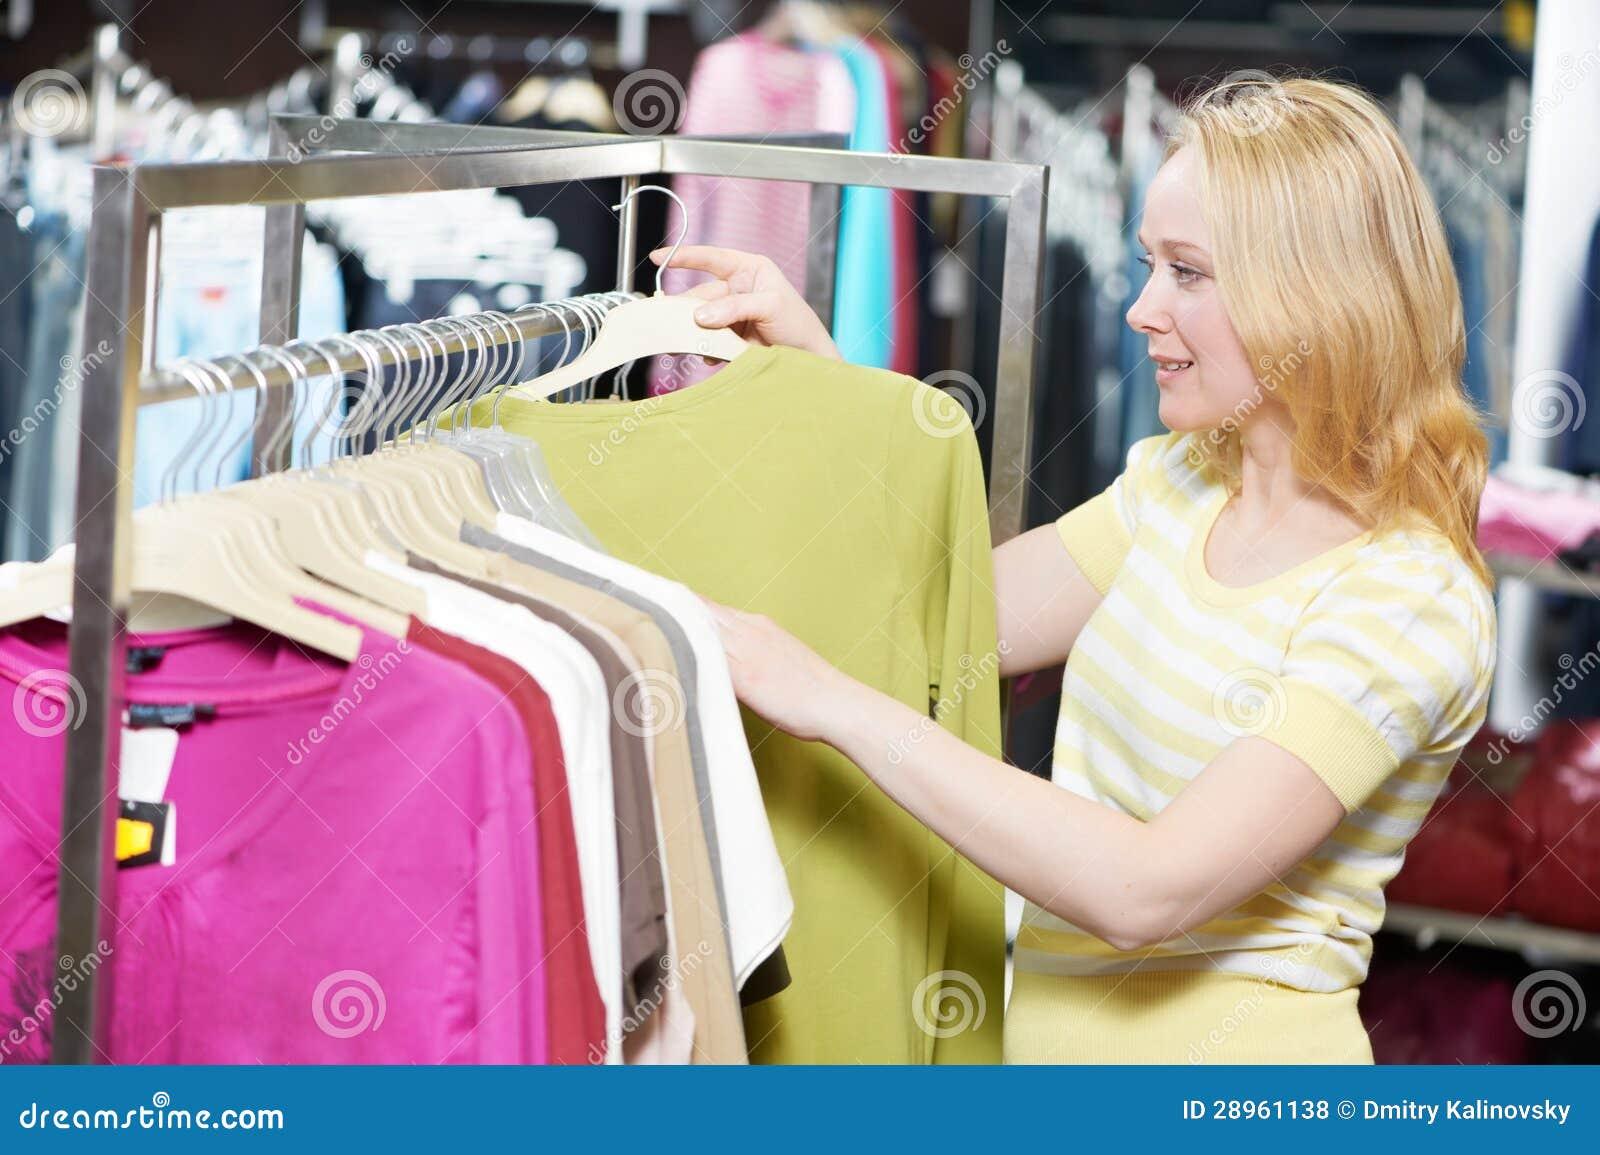 Women clothes catalog. Women clothing stores